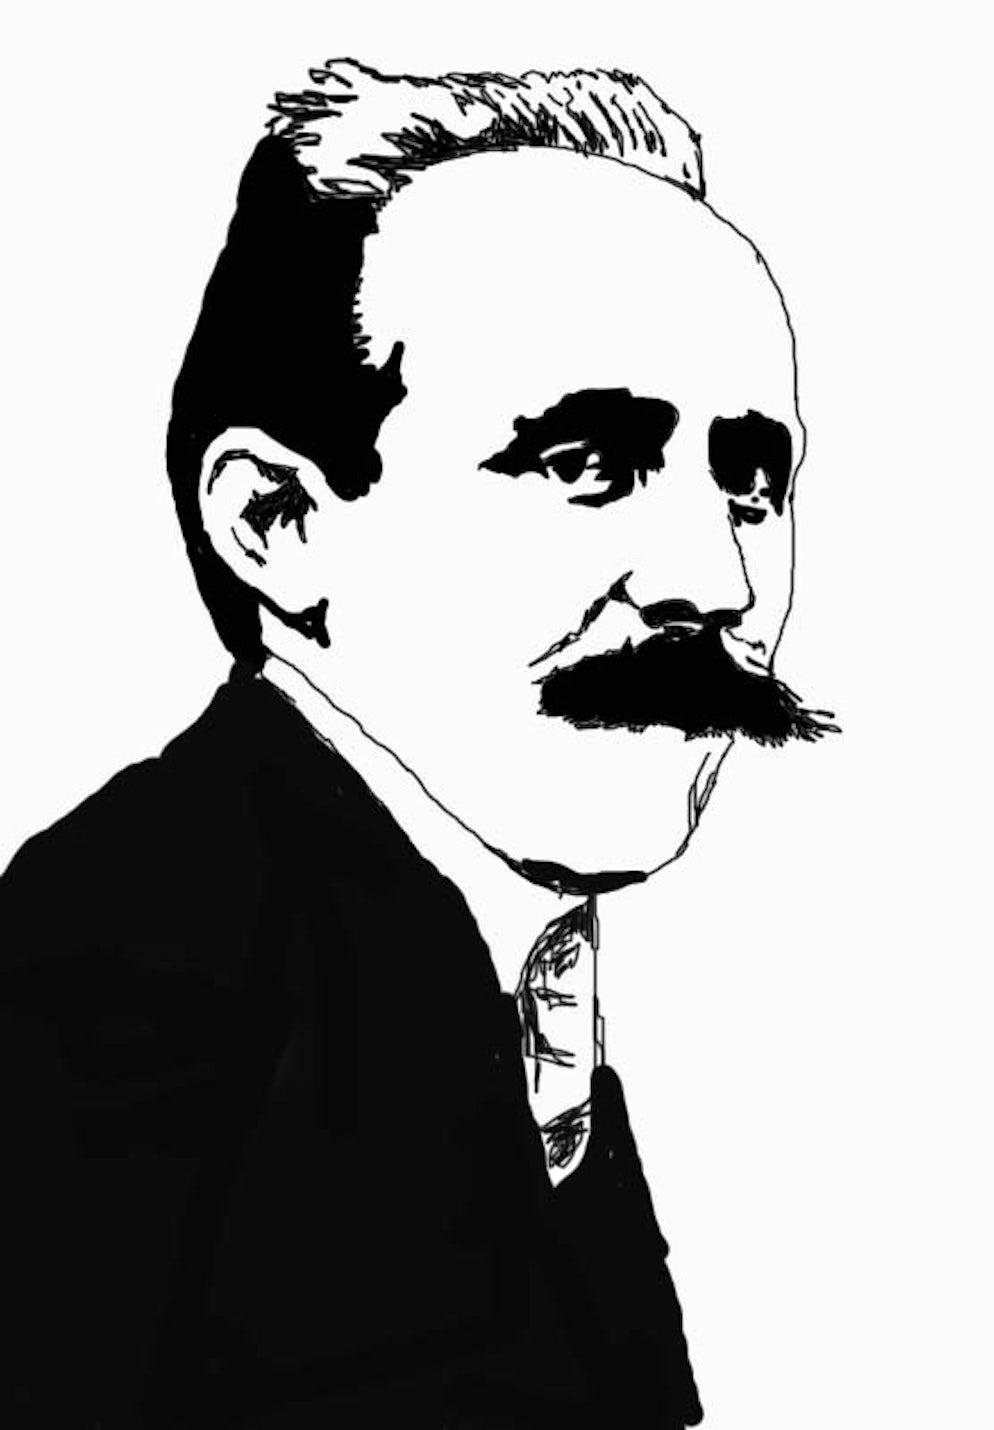 Picture © credits to Wikipedia/Rade Nagraisalović